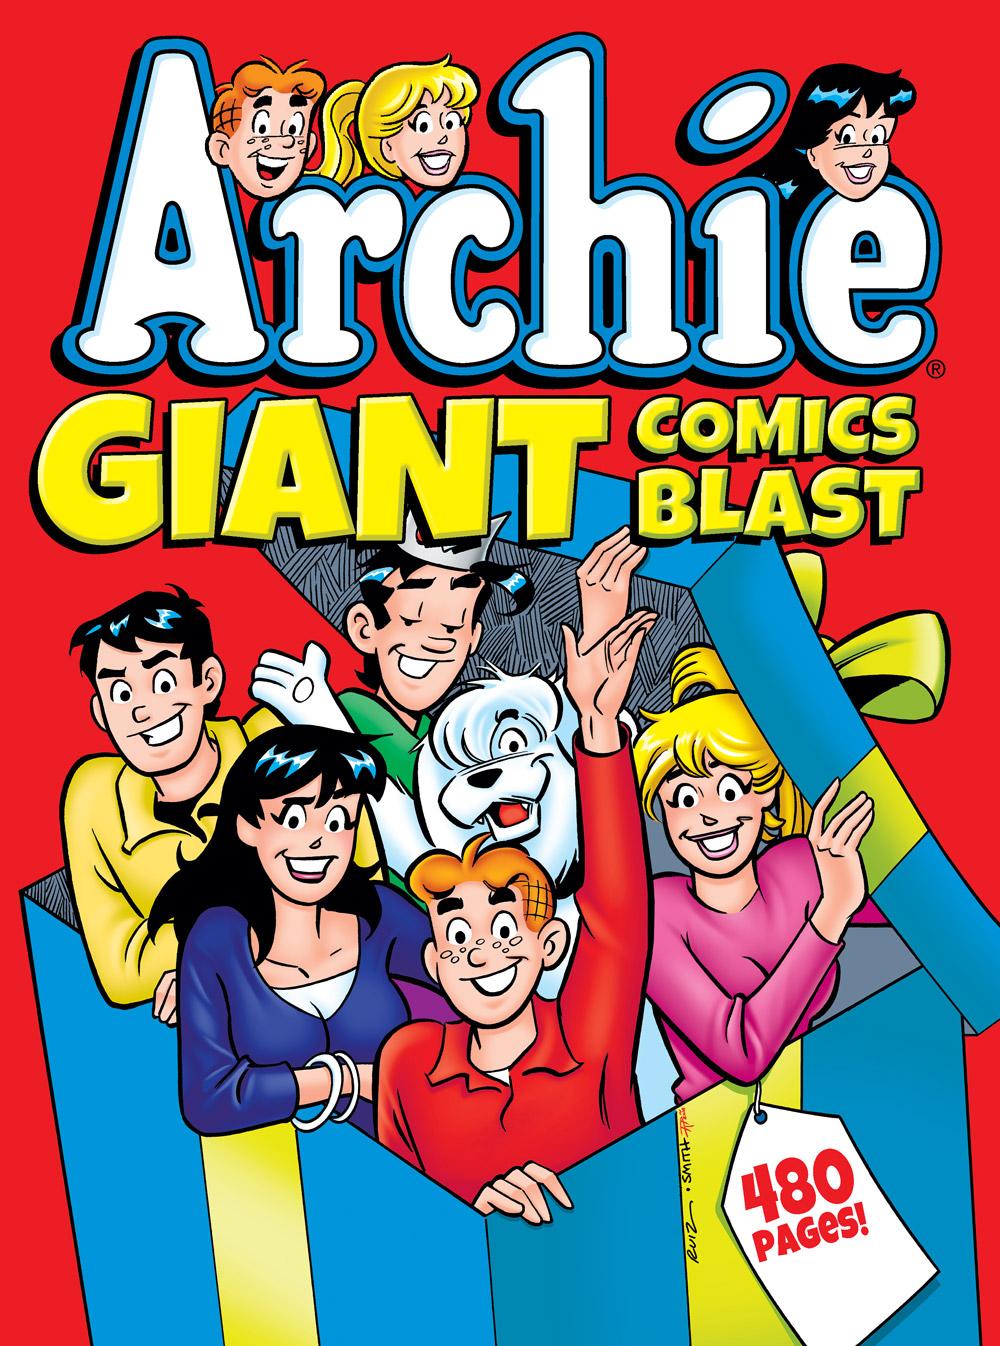 ARCHIE GIANT COMICS BLAST Cover